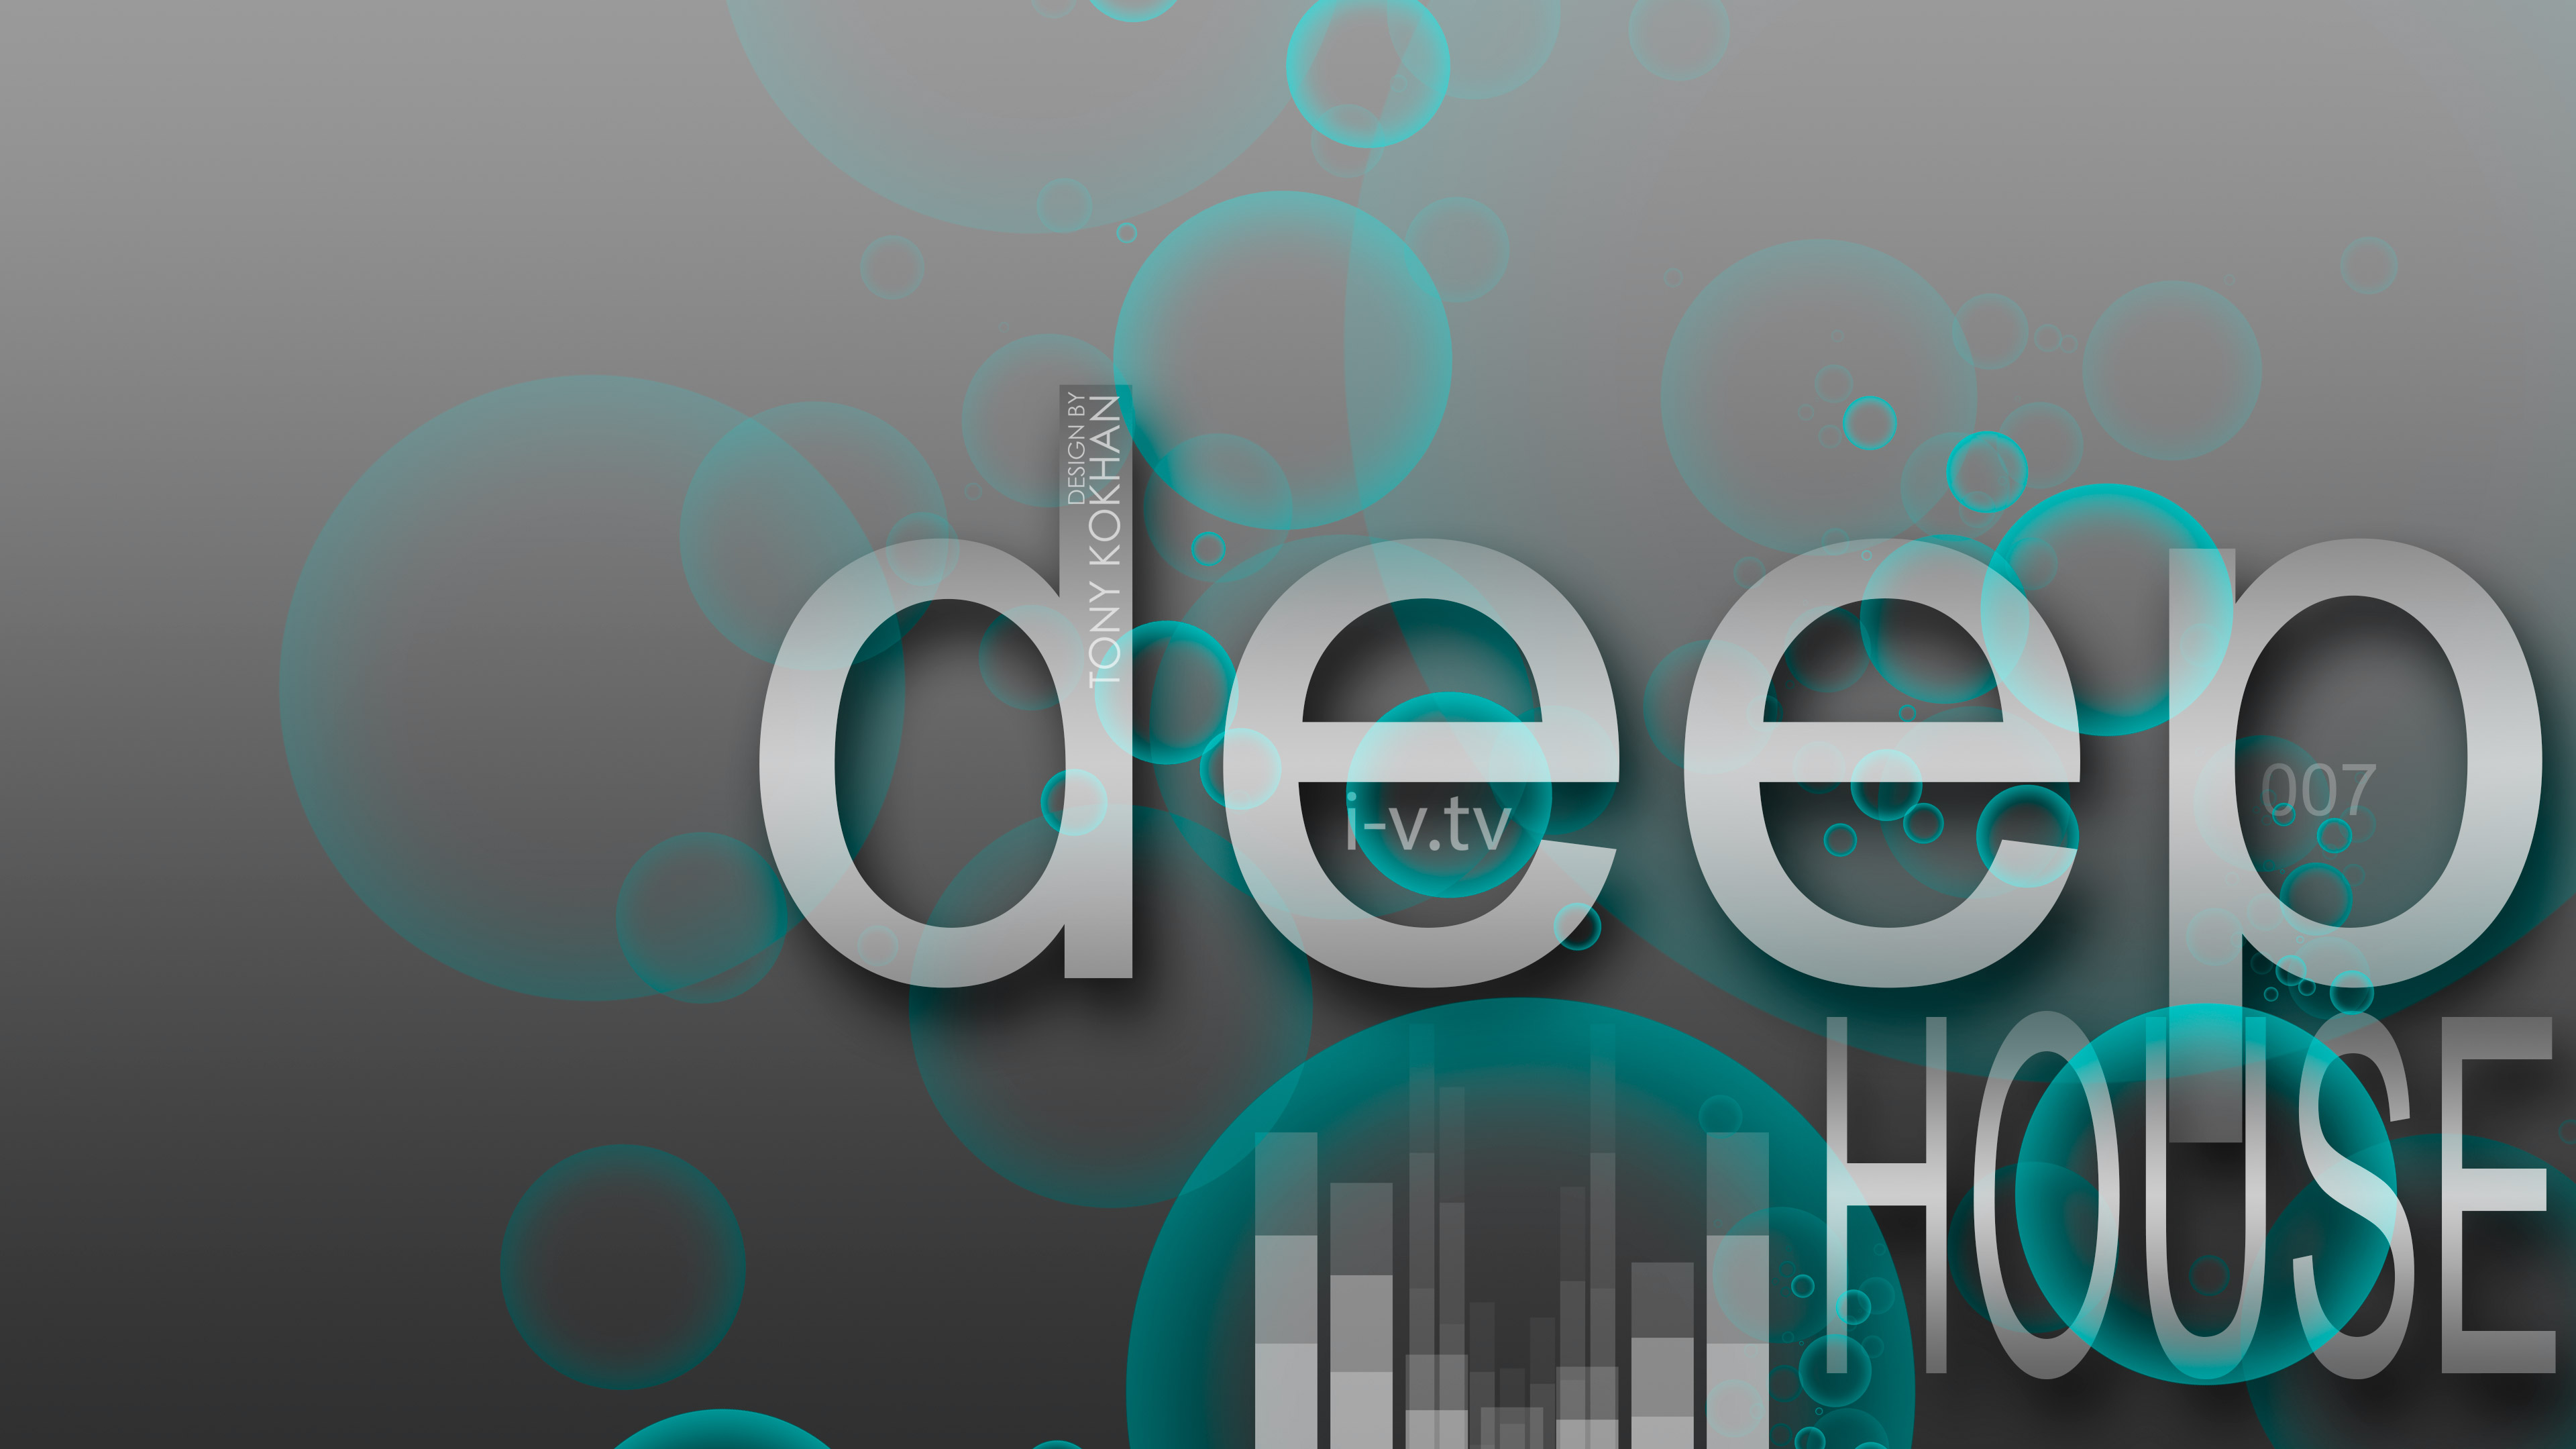 Deep House Music eQ Bubble Style 2015 Art Deep Seven Sound 3840x2160